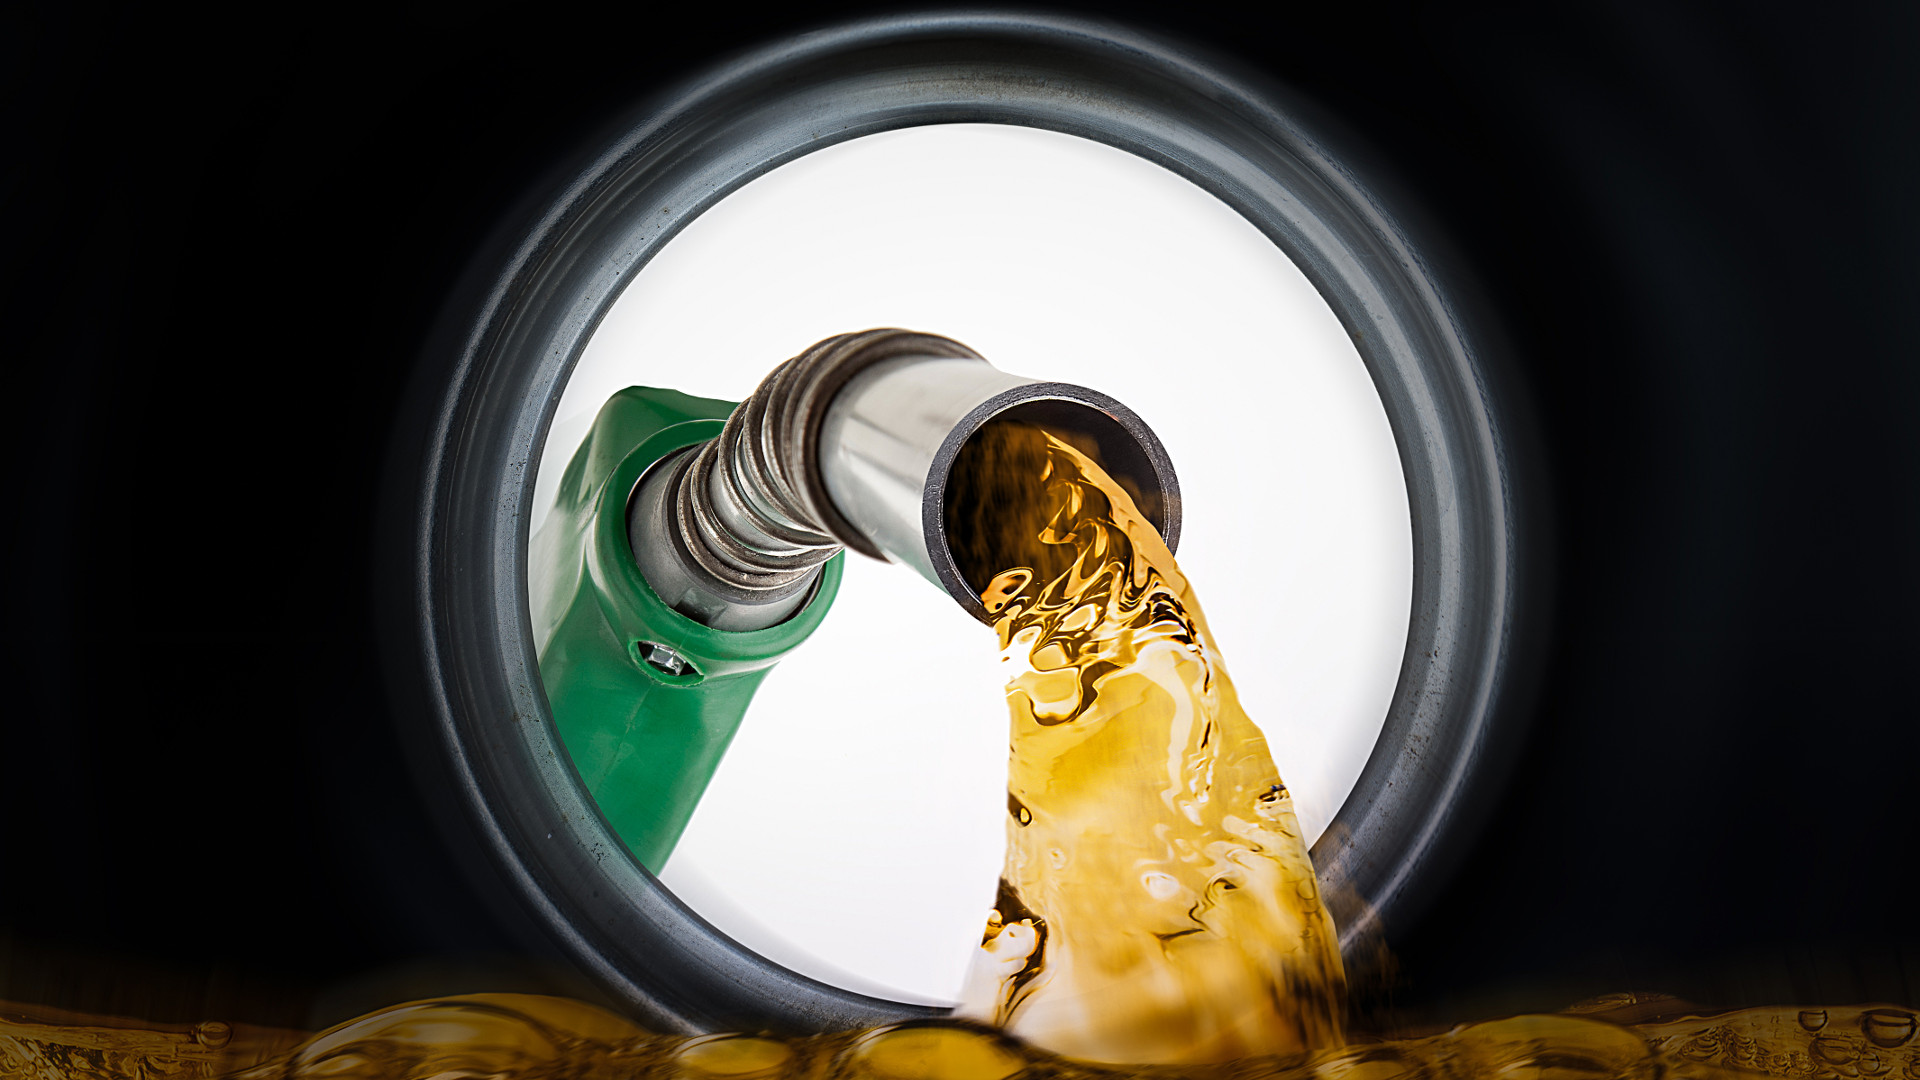 combustivel, combustiveis fosseis, posto de combustivel, postos gasolina, combustiveis, combustíveis, preço combustiveis, preços combustiveis, preço dos combustiveis, anp preços, posto de gasolina ipiranga, petrobras preços combustiveis, gasolina, etanol, gnv, óleo diesel, gasolina aditivada, preço do etanol, etanol ou gasolina, etanol combustivel, raízen, shell, ipiranga